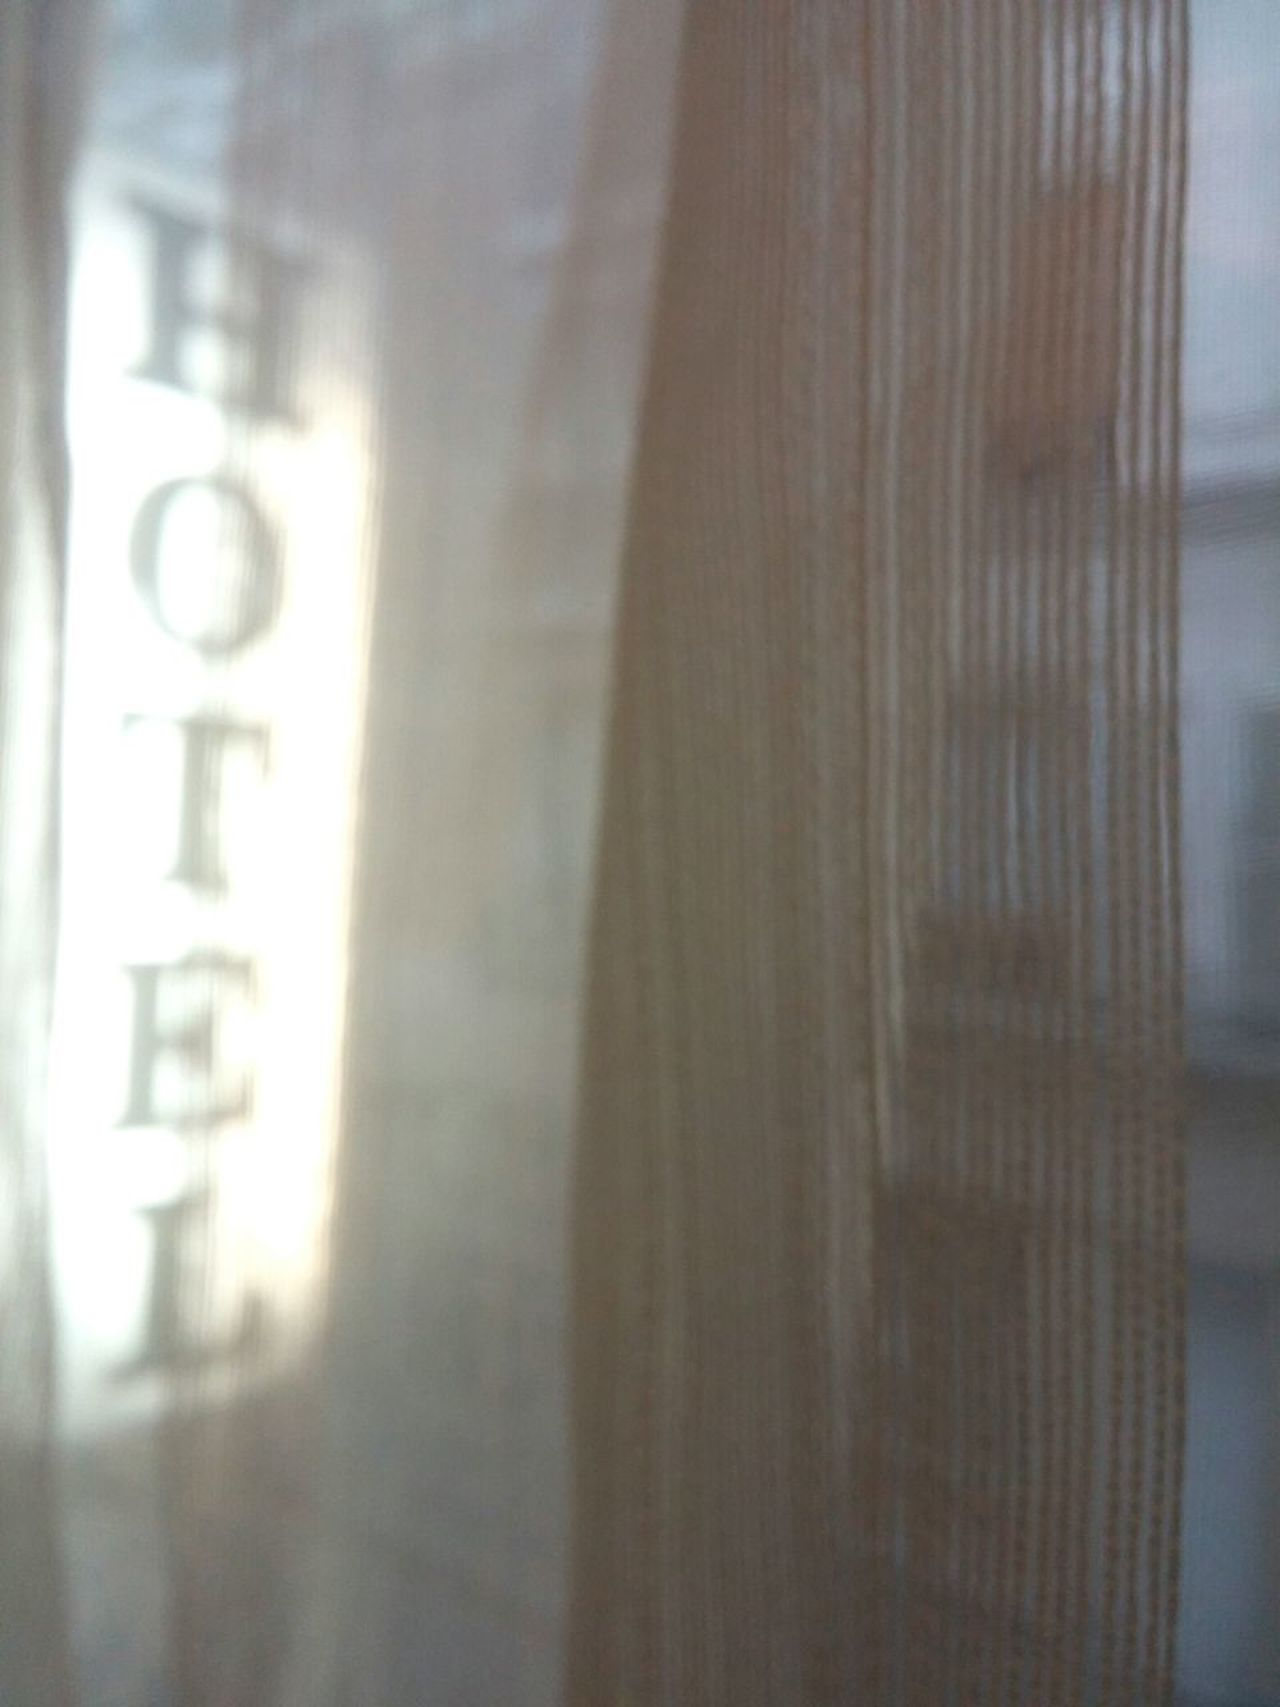 Montmartre Monochrome EyeEmPhotoCommunity EyeEmBestPics LGg3photography Travel Destinations France🇫🇷 Paris, France  Europetrip No People LGG3 Monochromatic EyeEmNewHere